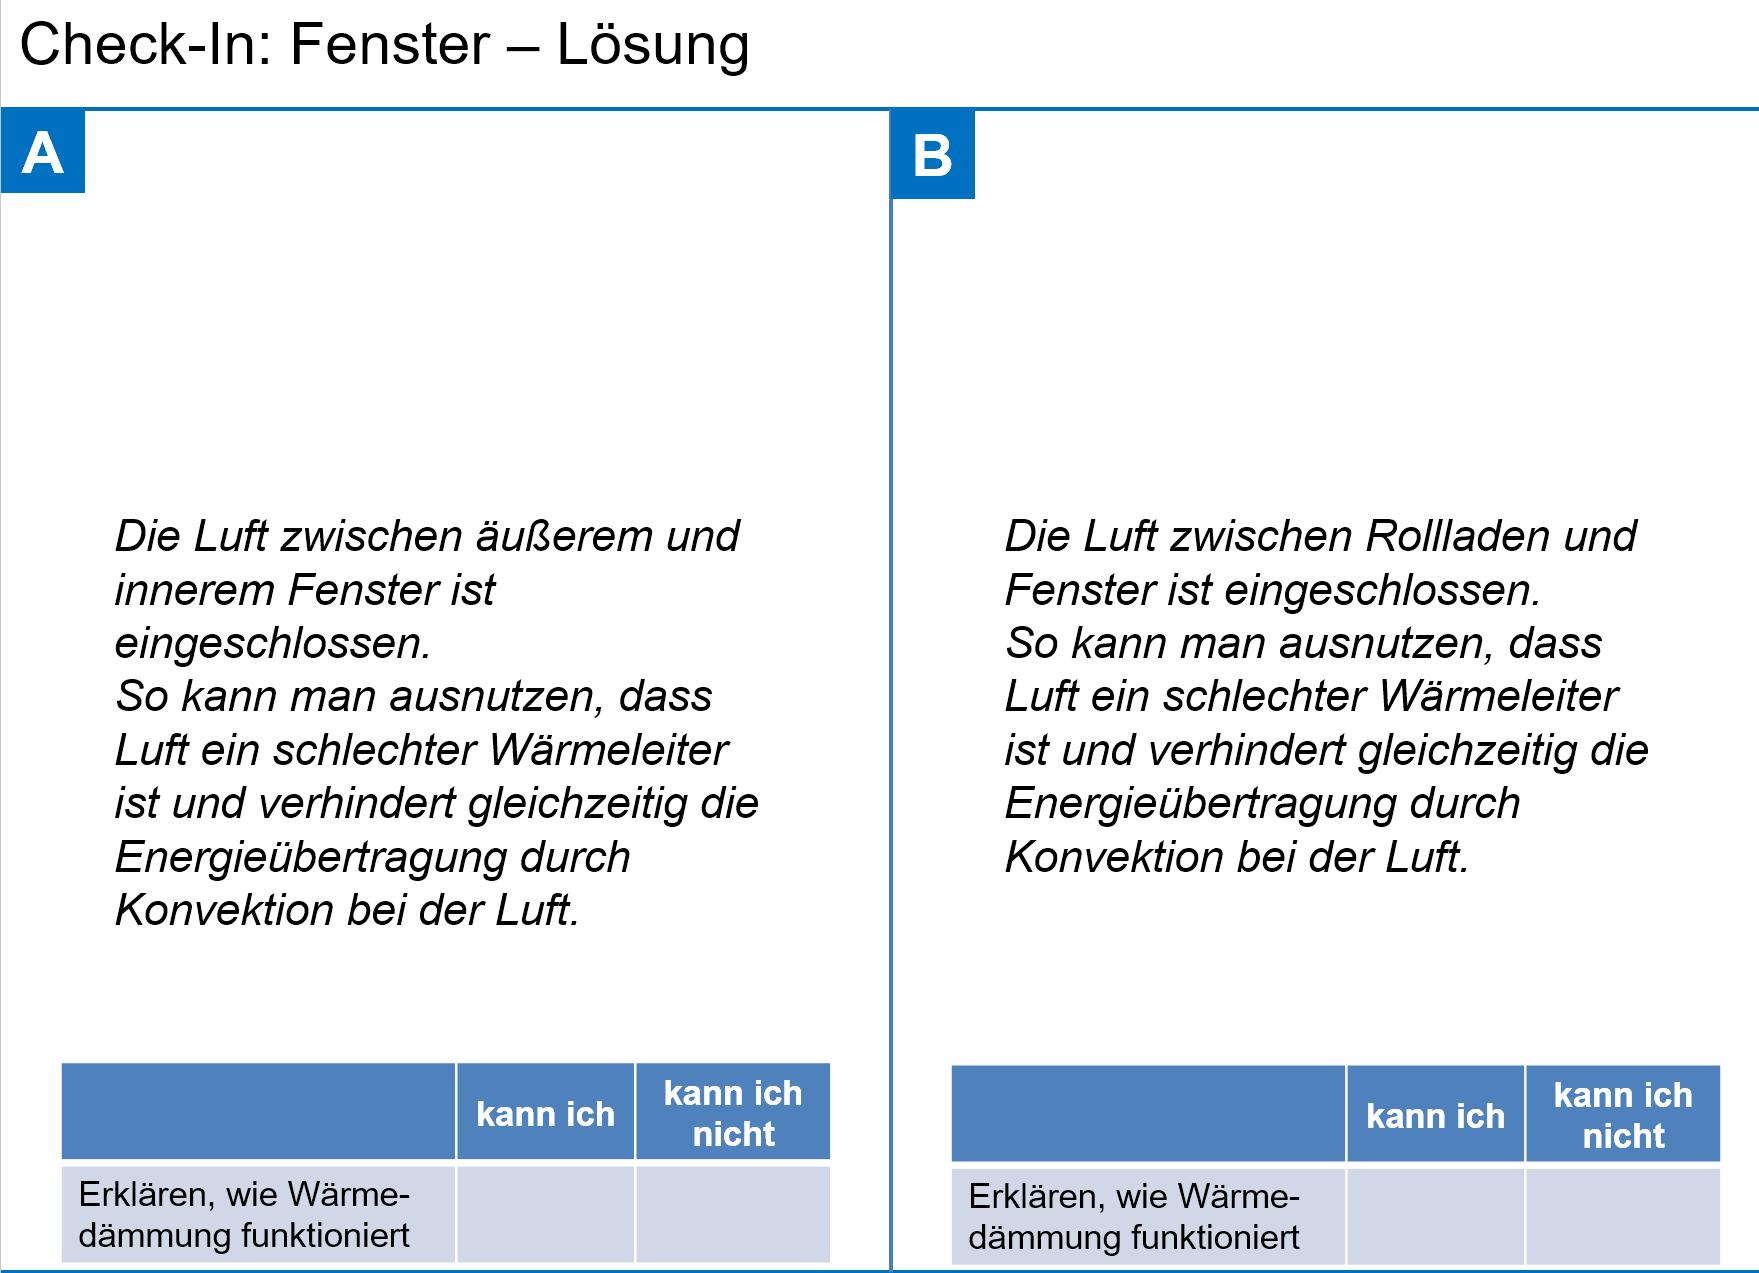 Fantastisch Budgetierung Mathe Arbeitsblatt Ideen - Gemischte ...